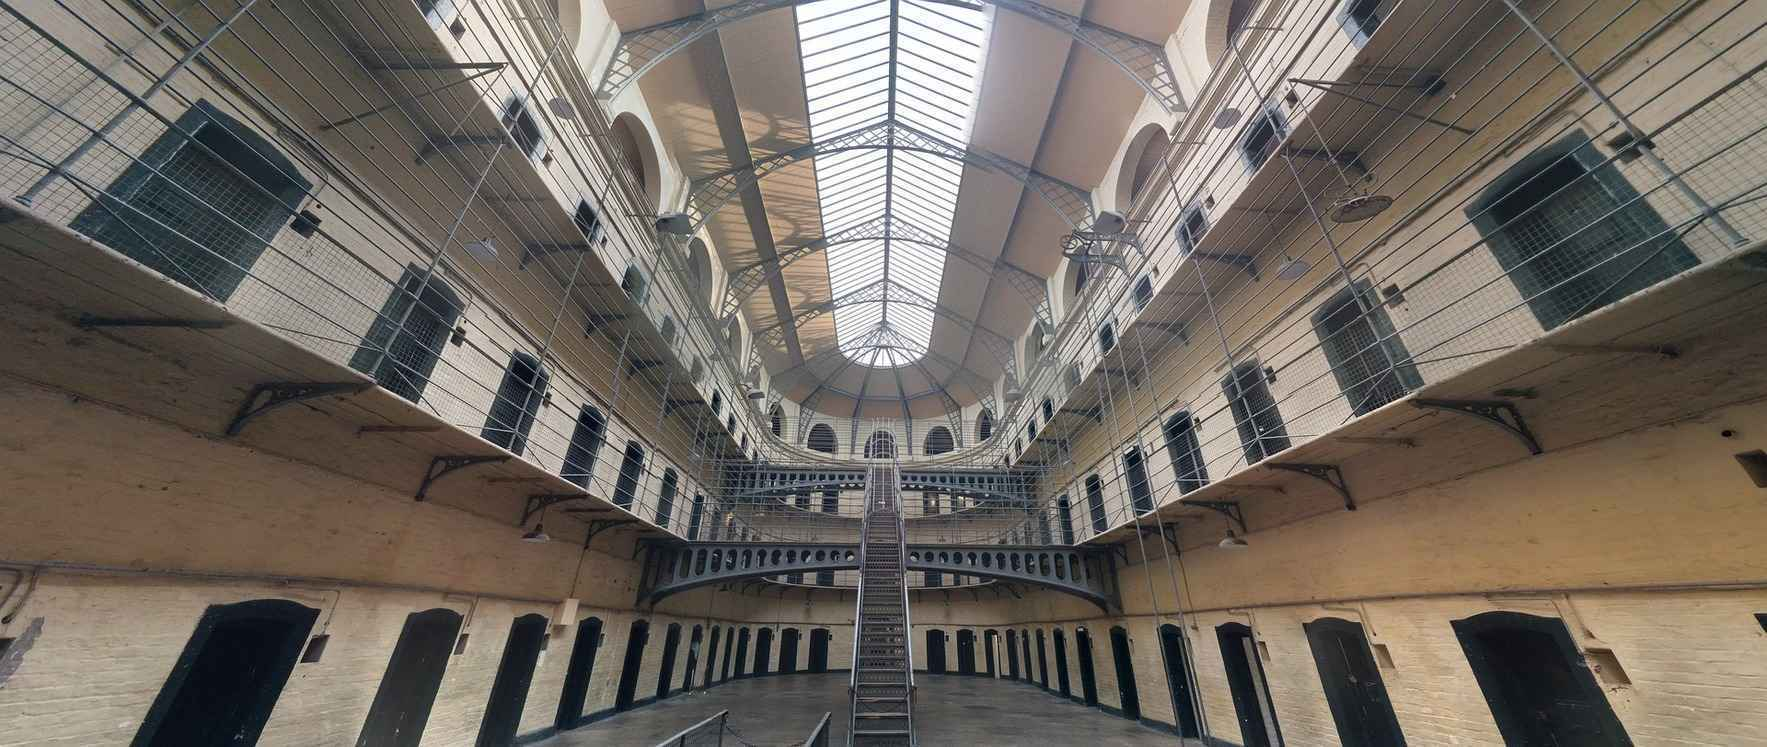 Help Abolish Private Prisons image